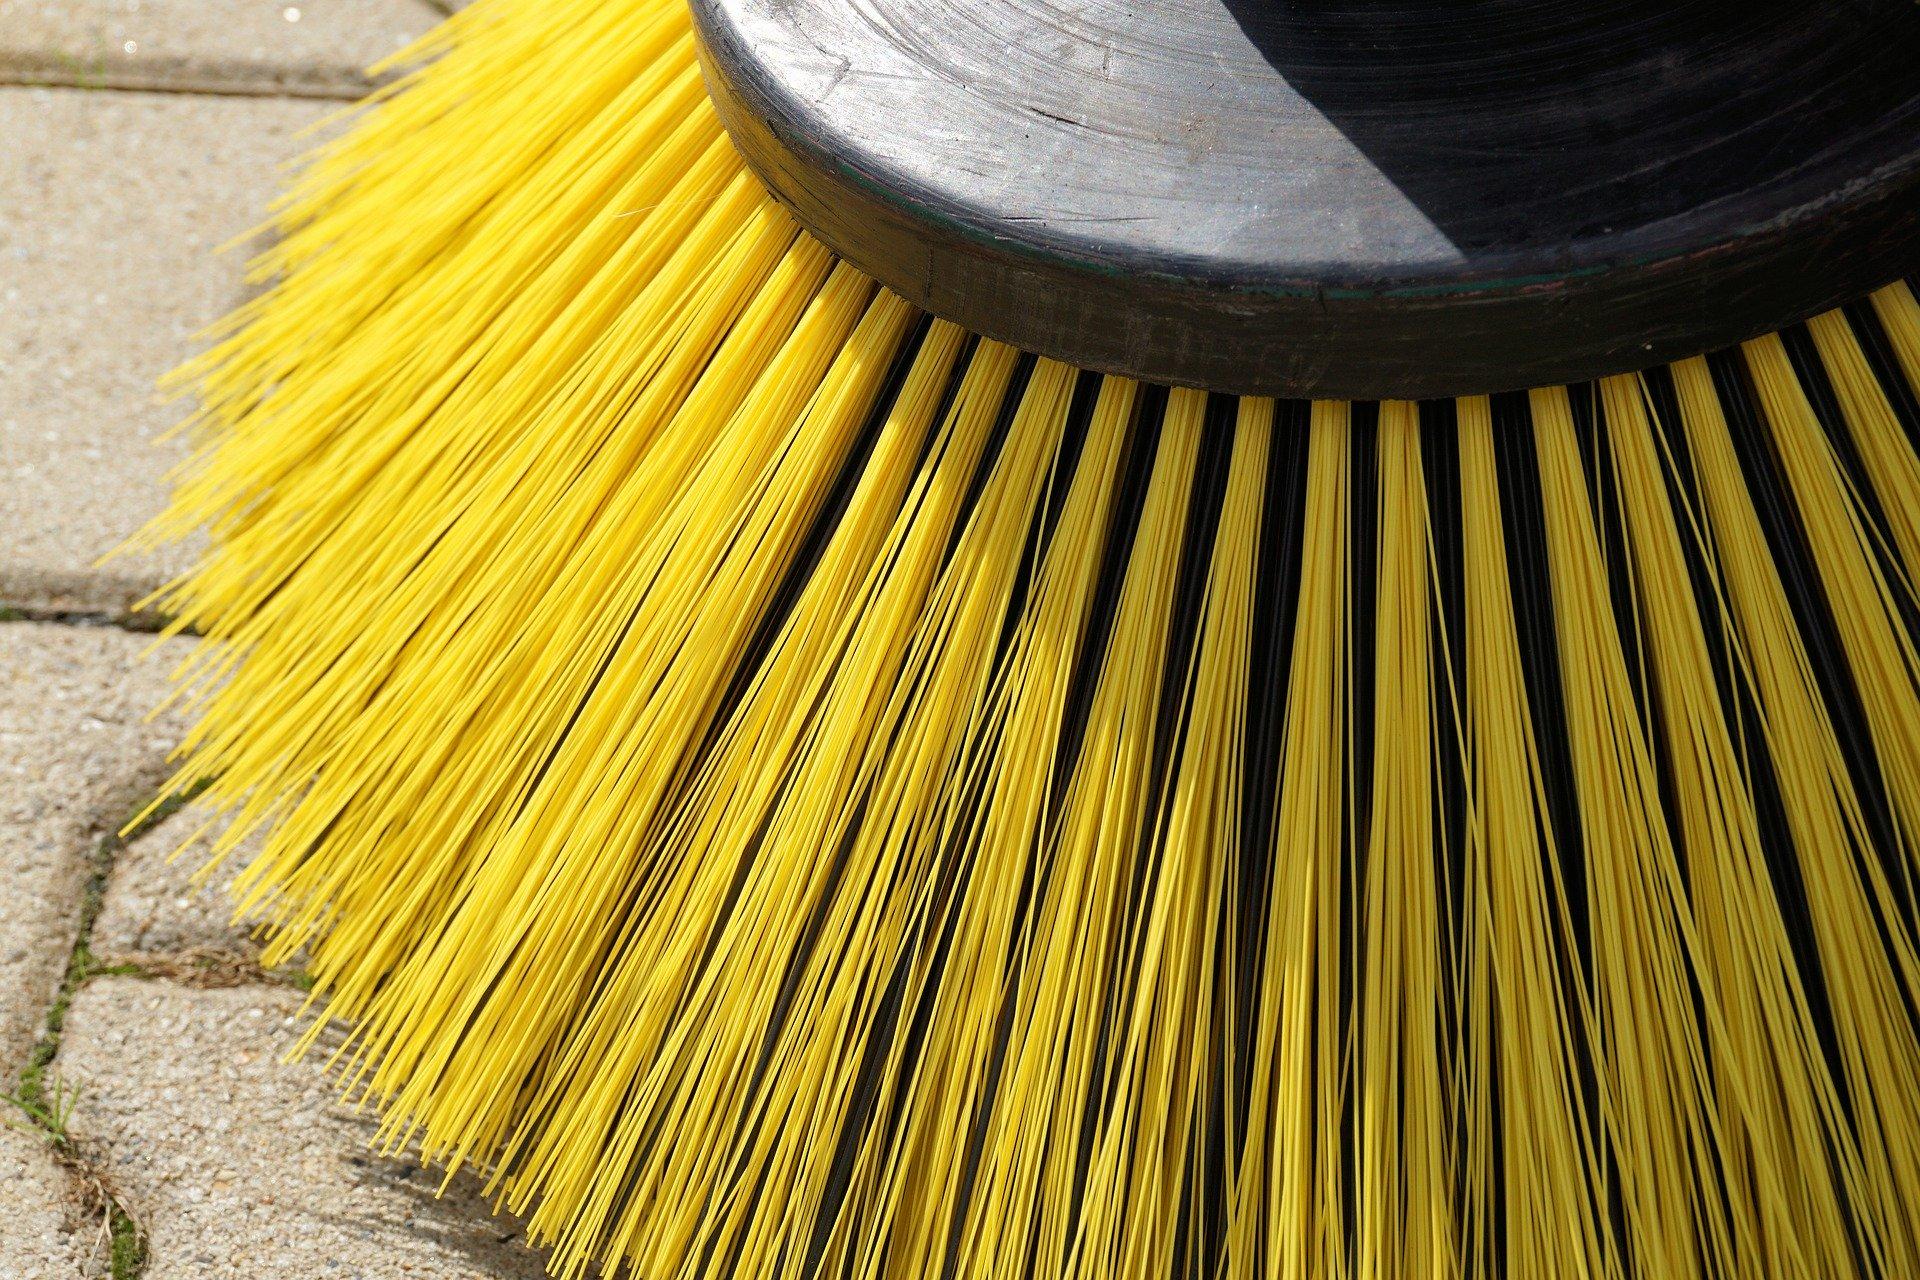 sweeper-1687445_1920